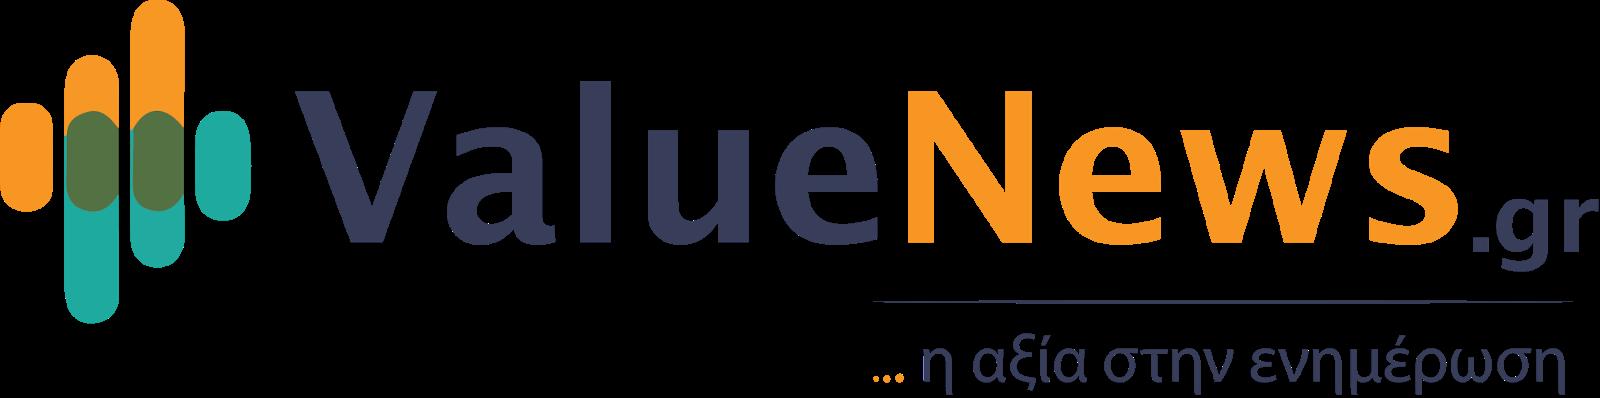 ValueNews.gr